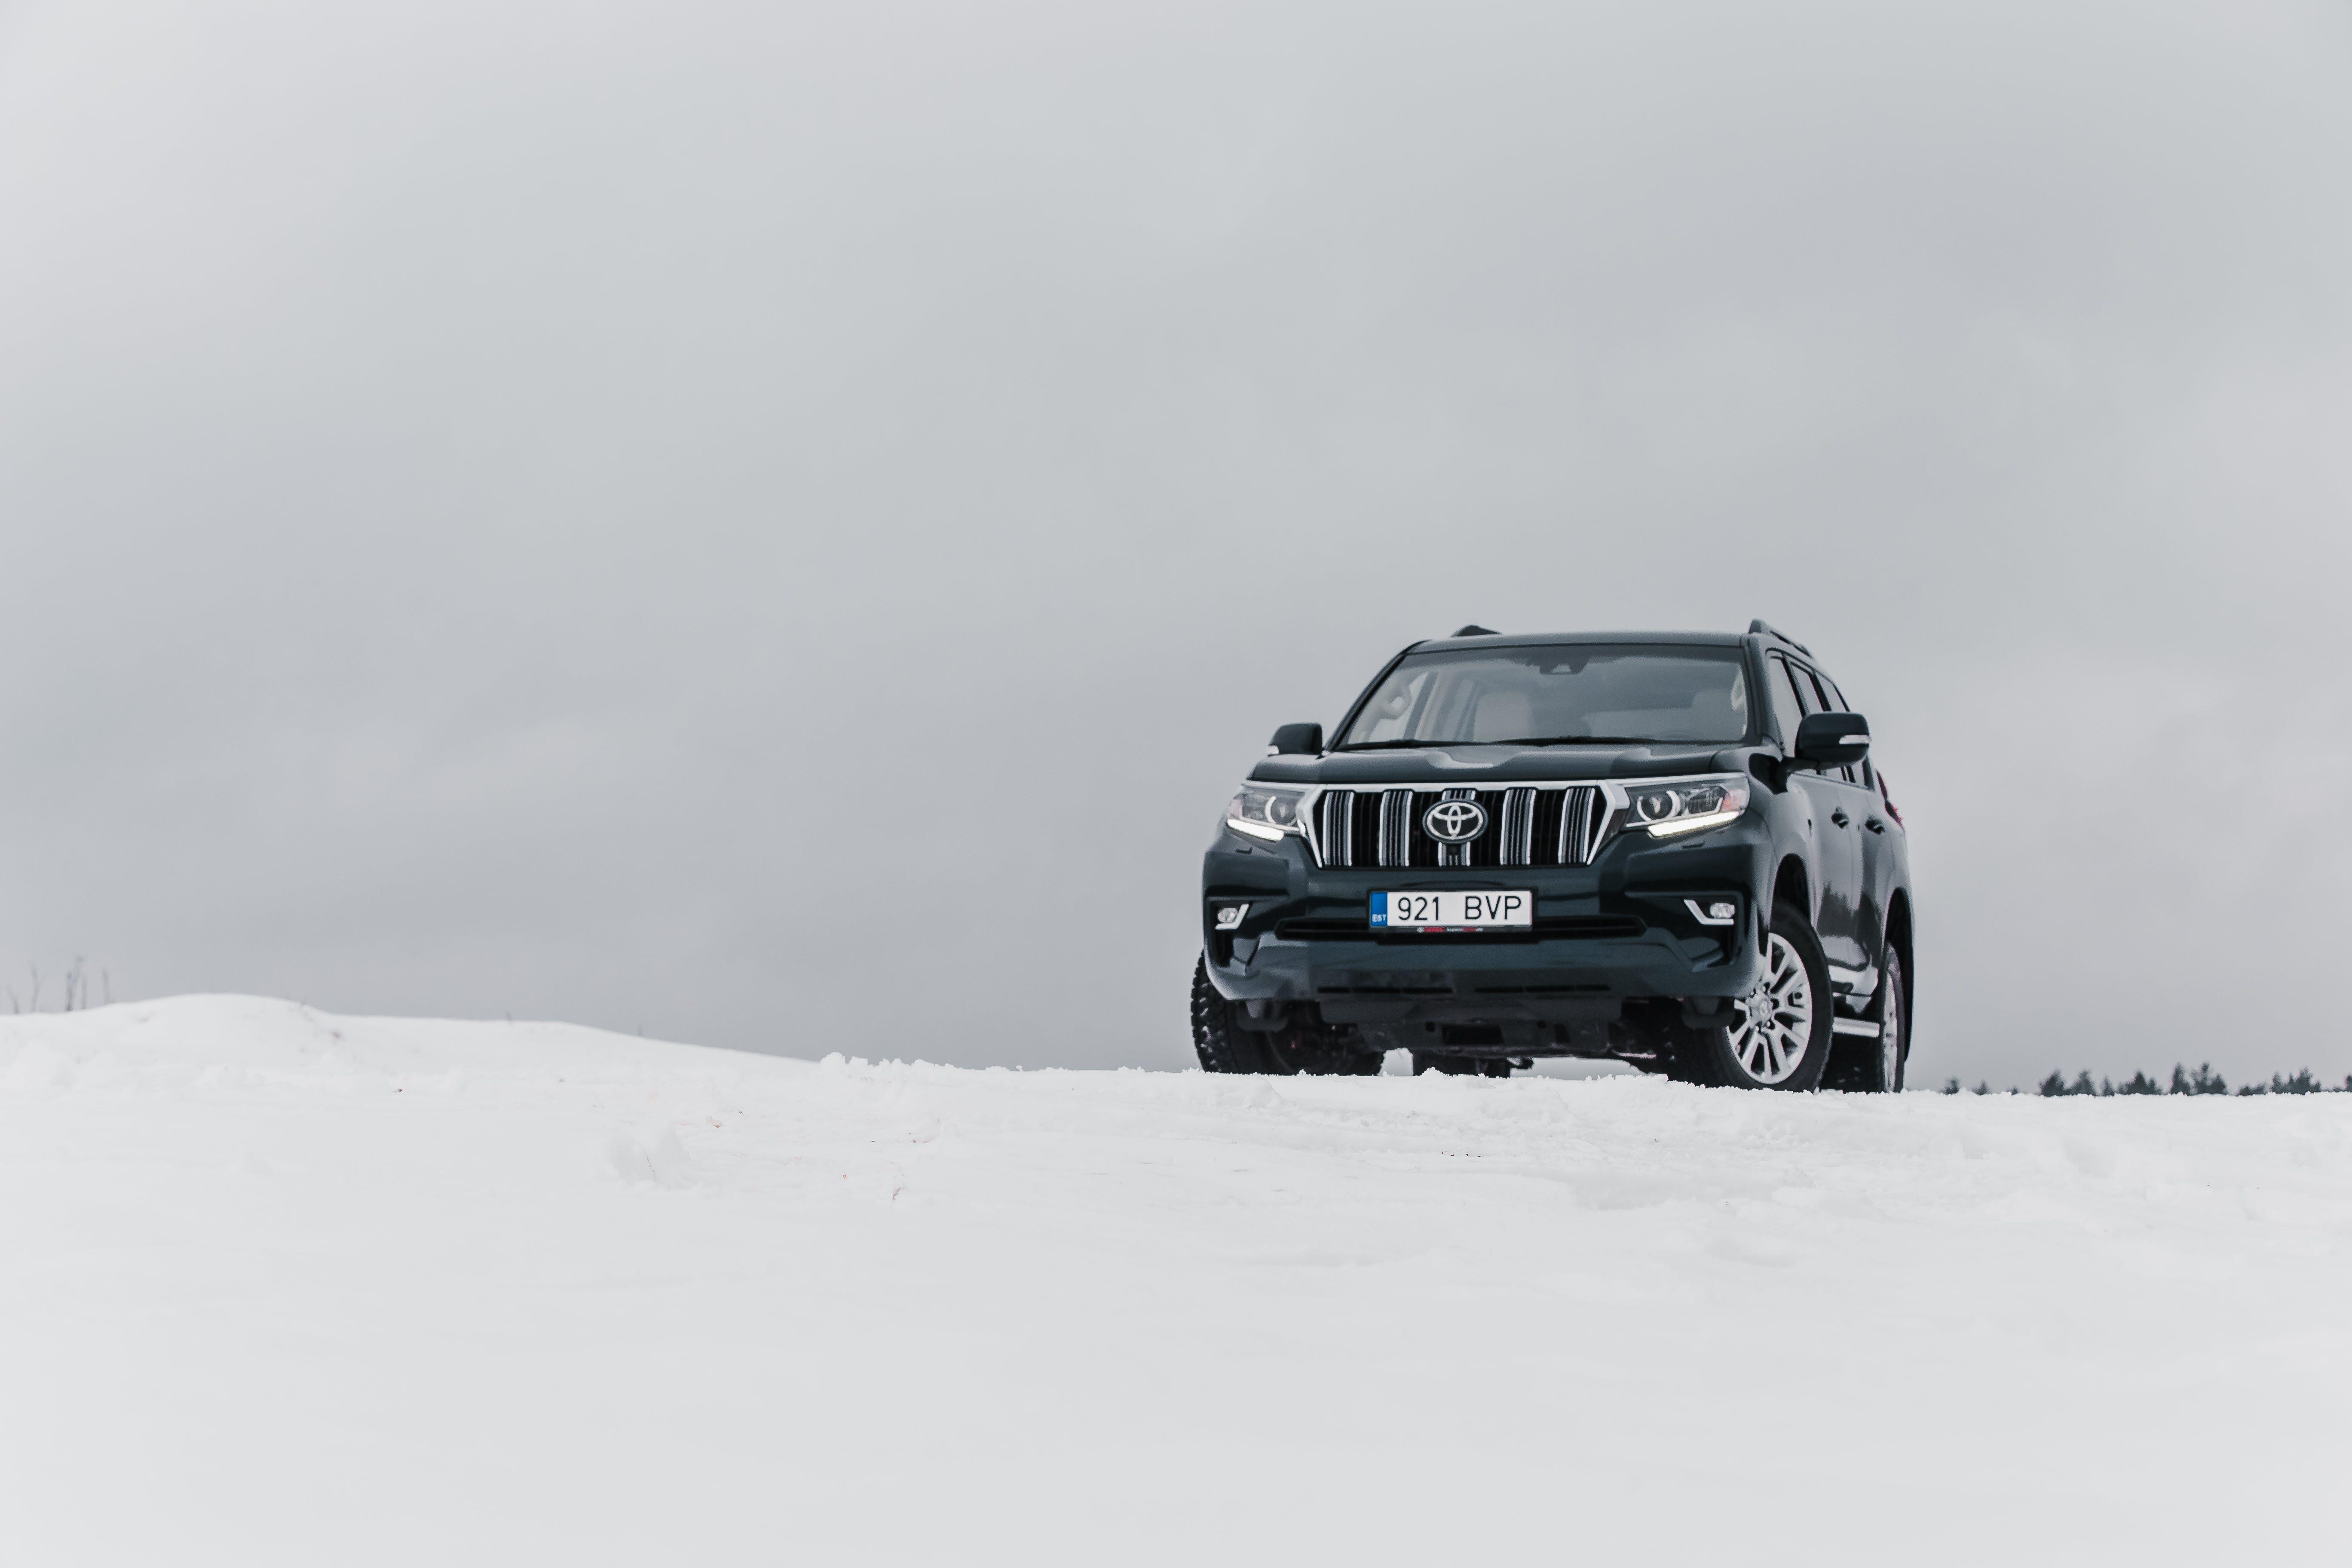 Free stock photo of winter, mountain, SUV, toyota